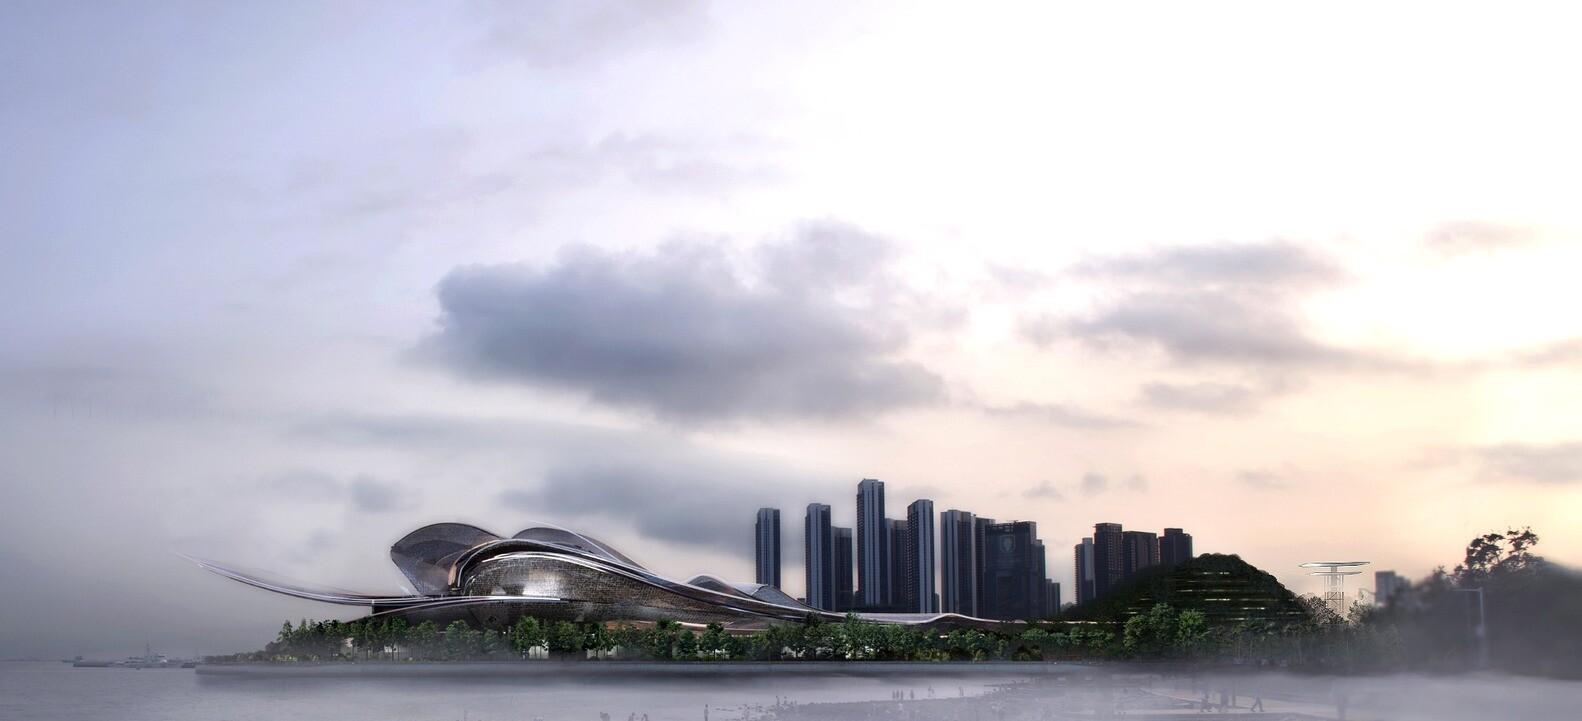 jean-nouvel-diseñara-la-opera-de-shenzhen-en-china-3-alt